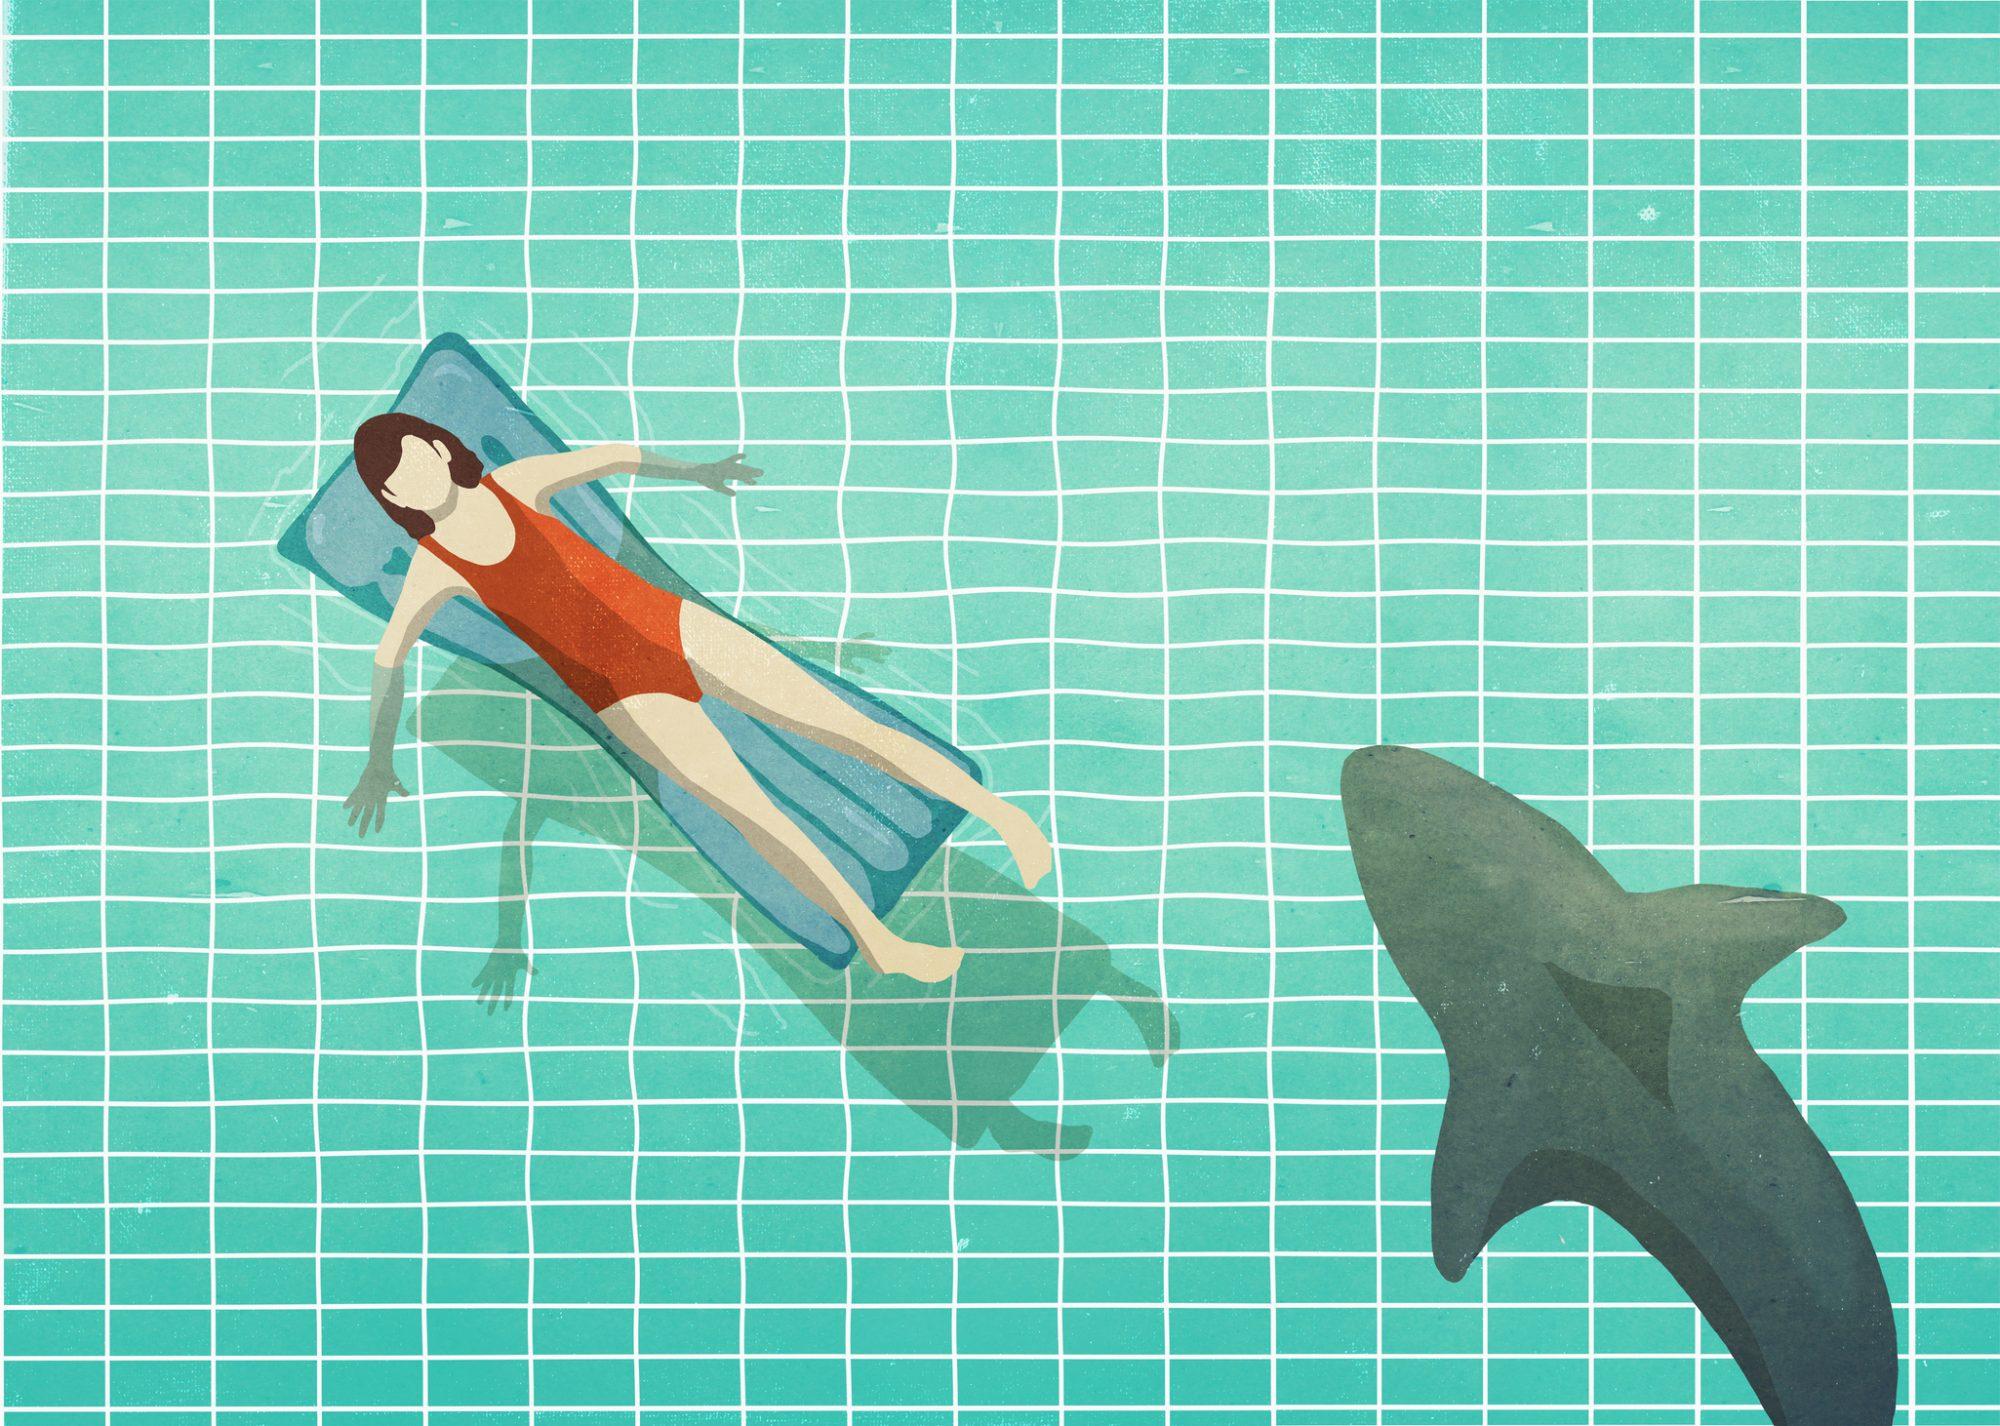 illustration of shark swimming near woman